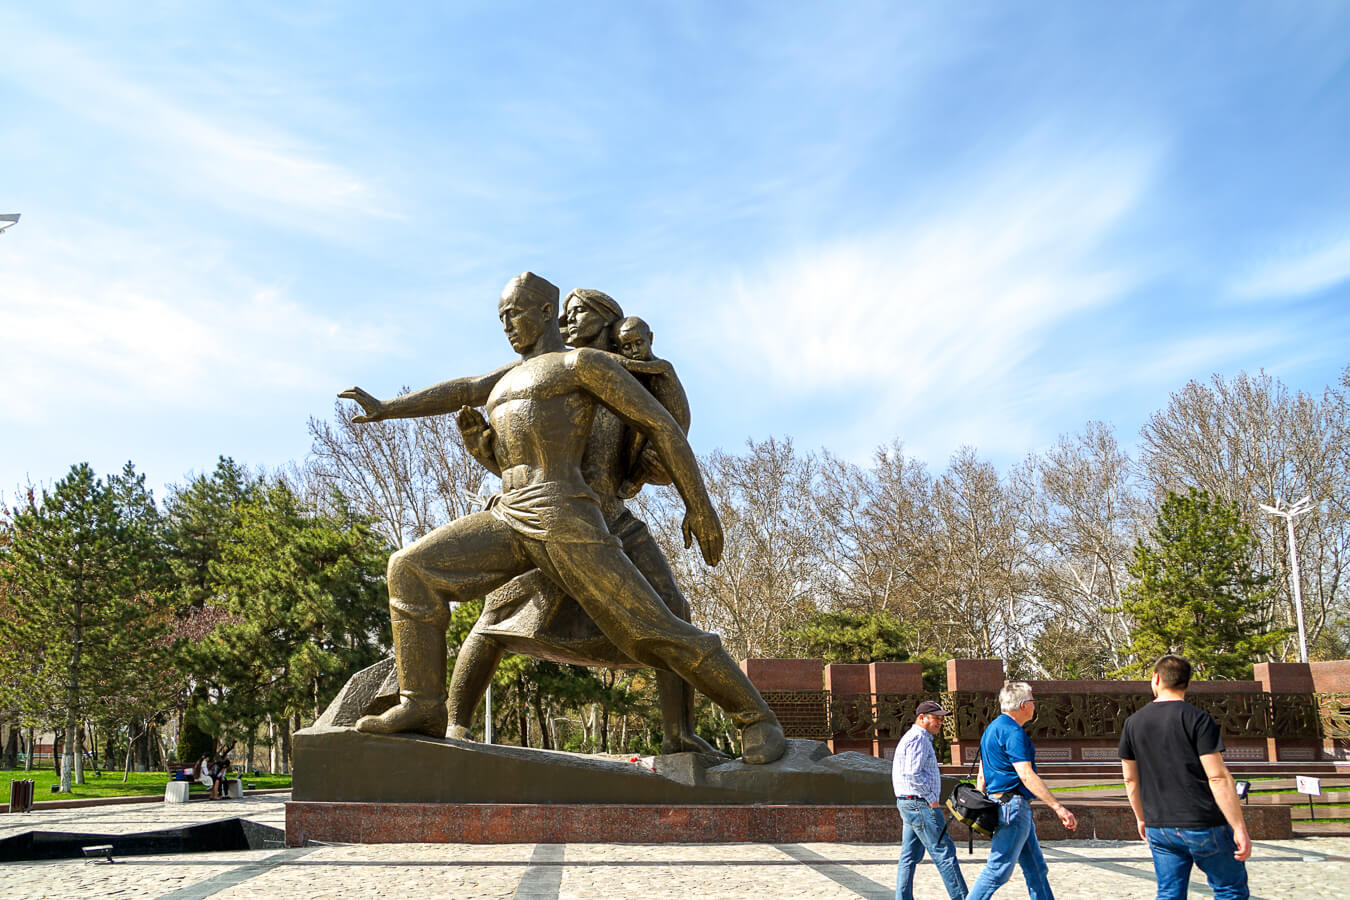 Tashkent city in Uzbekistan